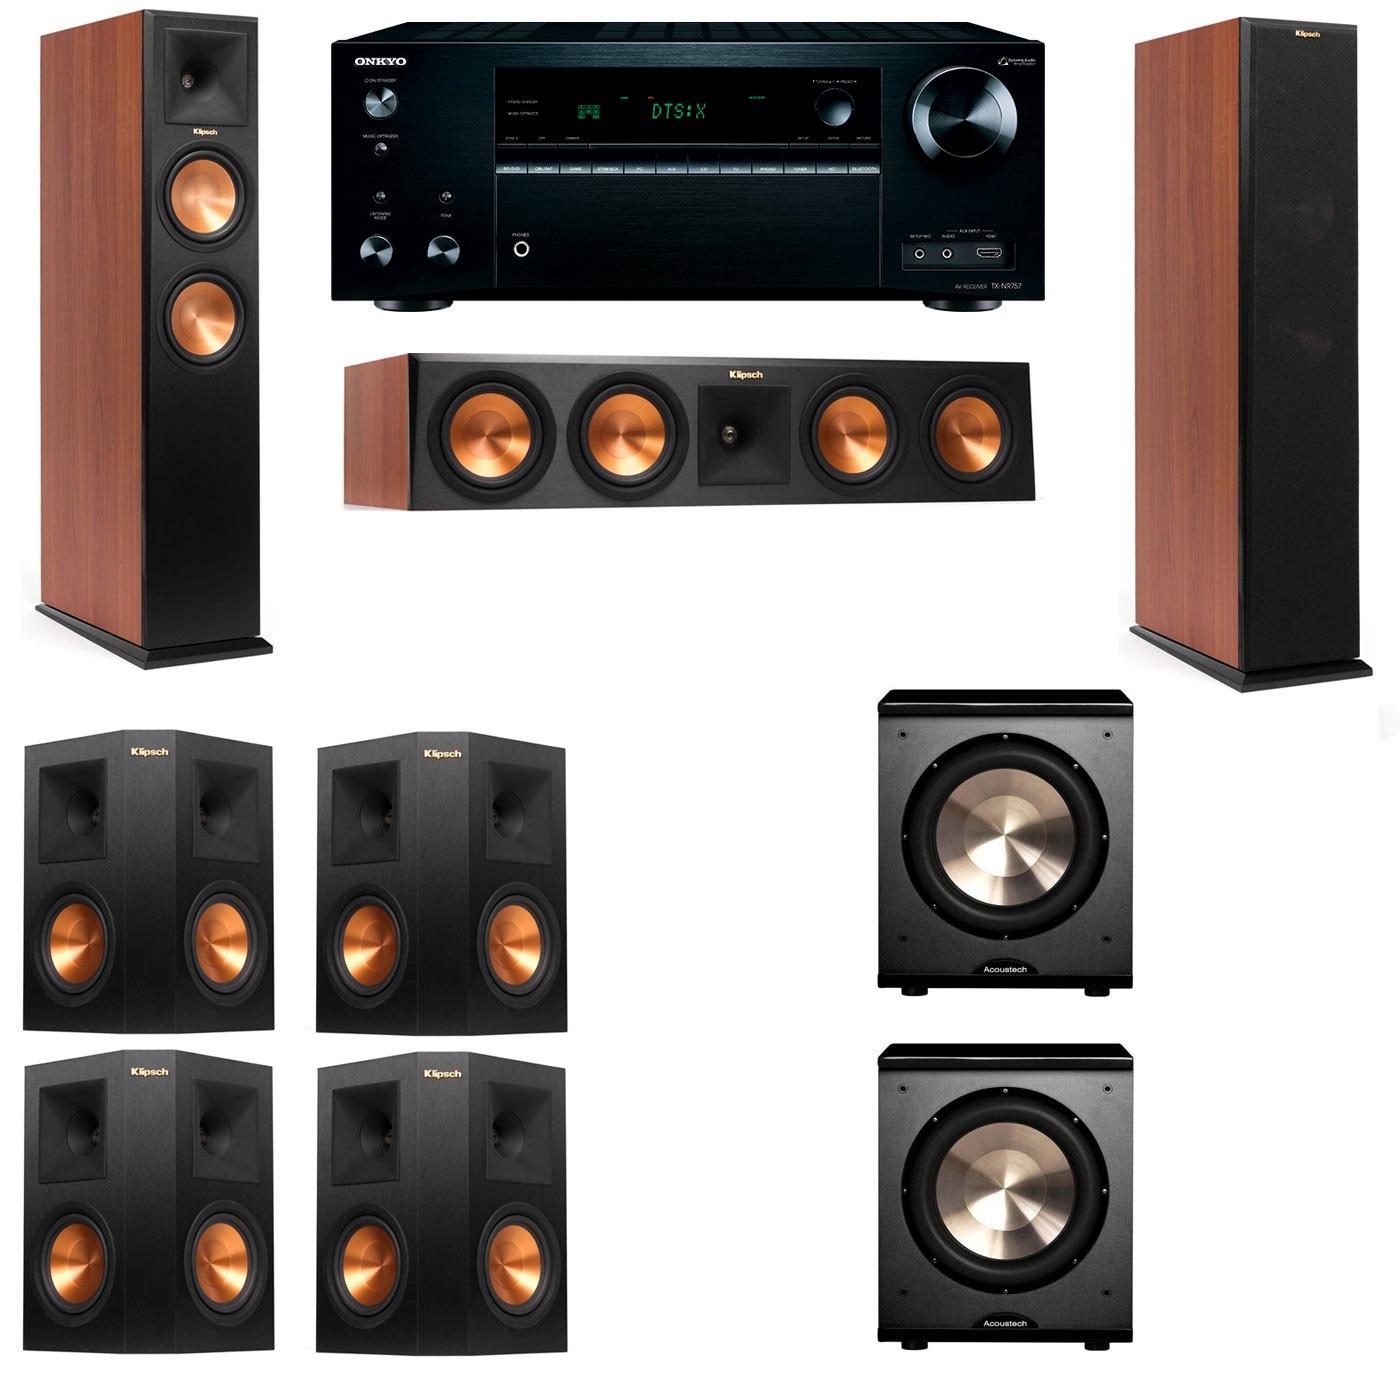 Klipsch RP-250F Tower Speakers CH-PL-200-7.2-Onkyo TX-NR757